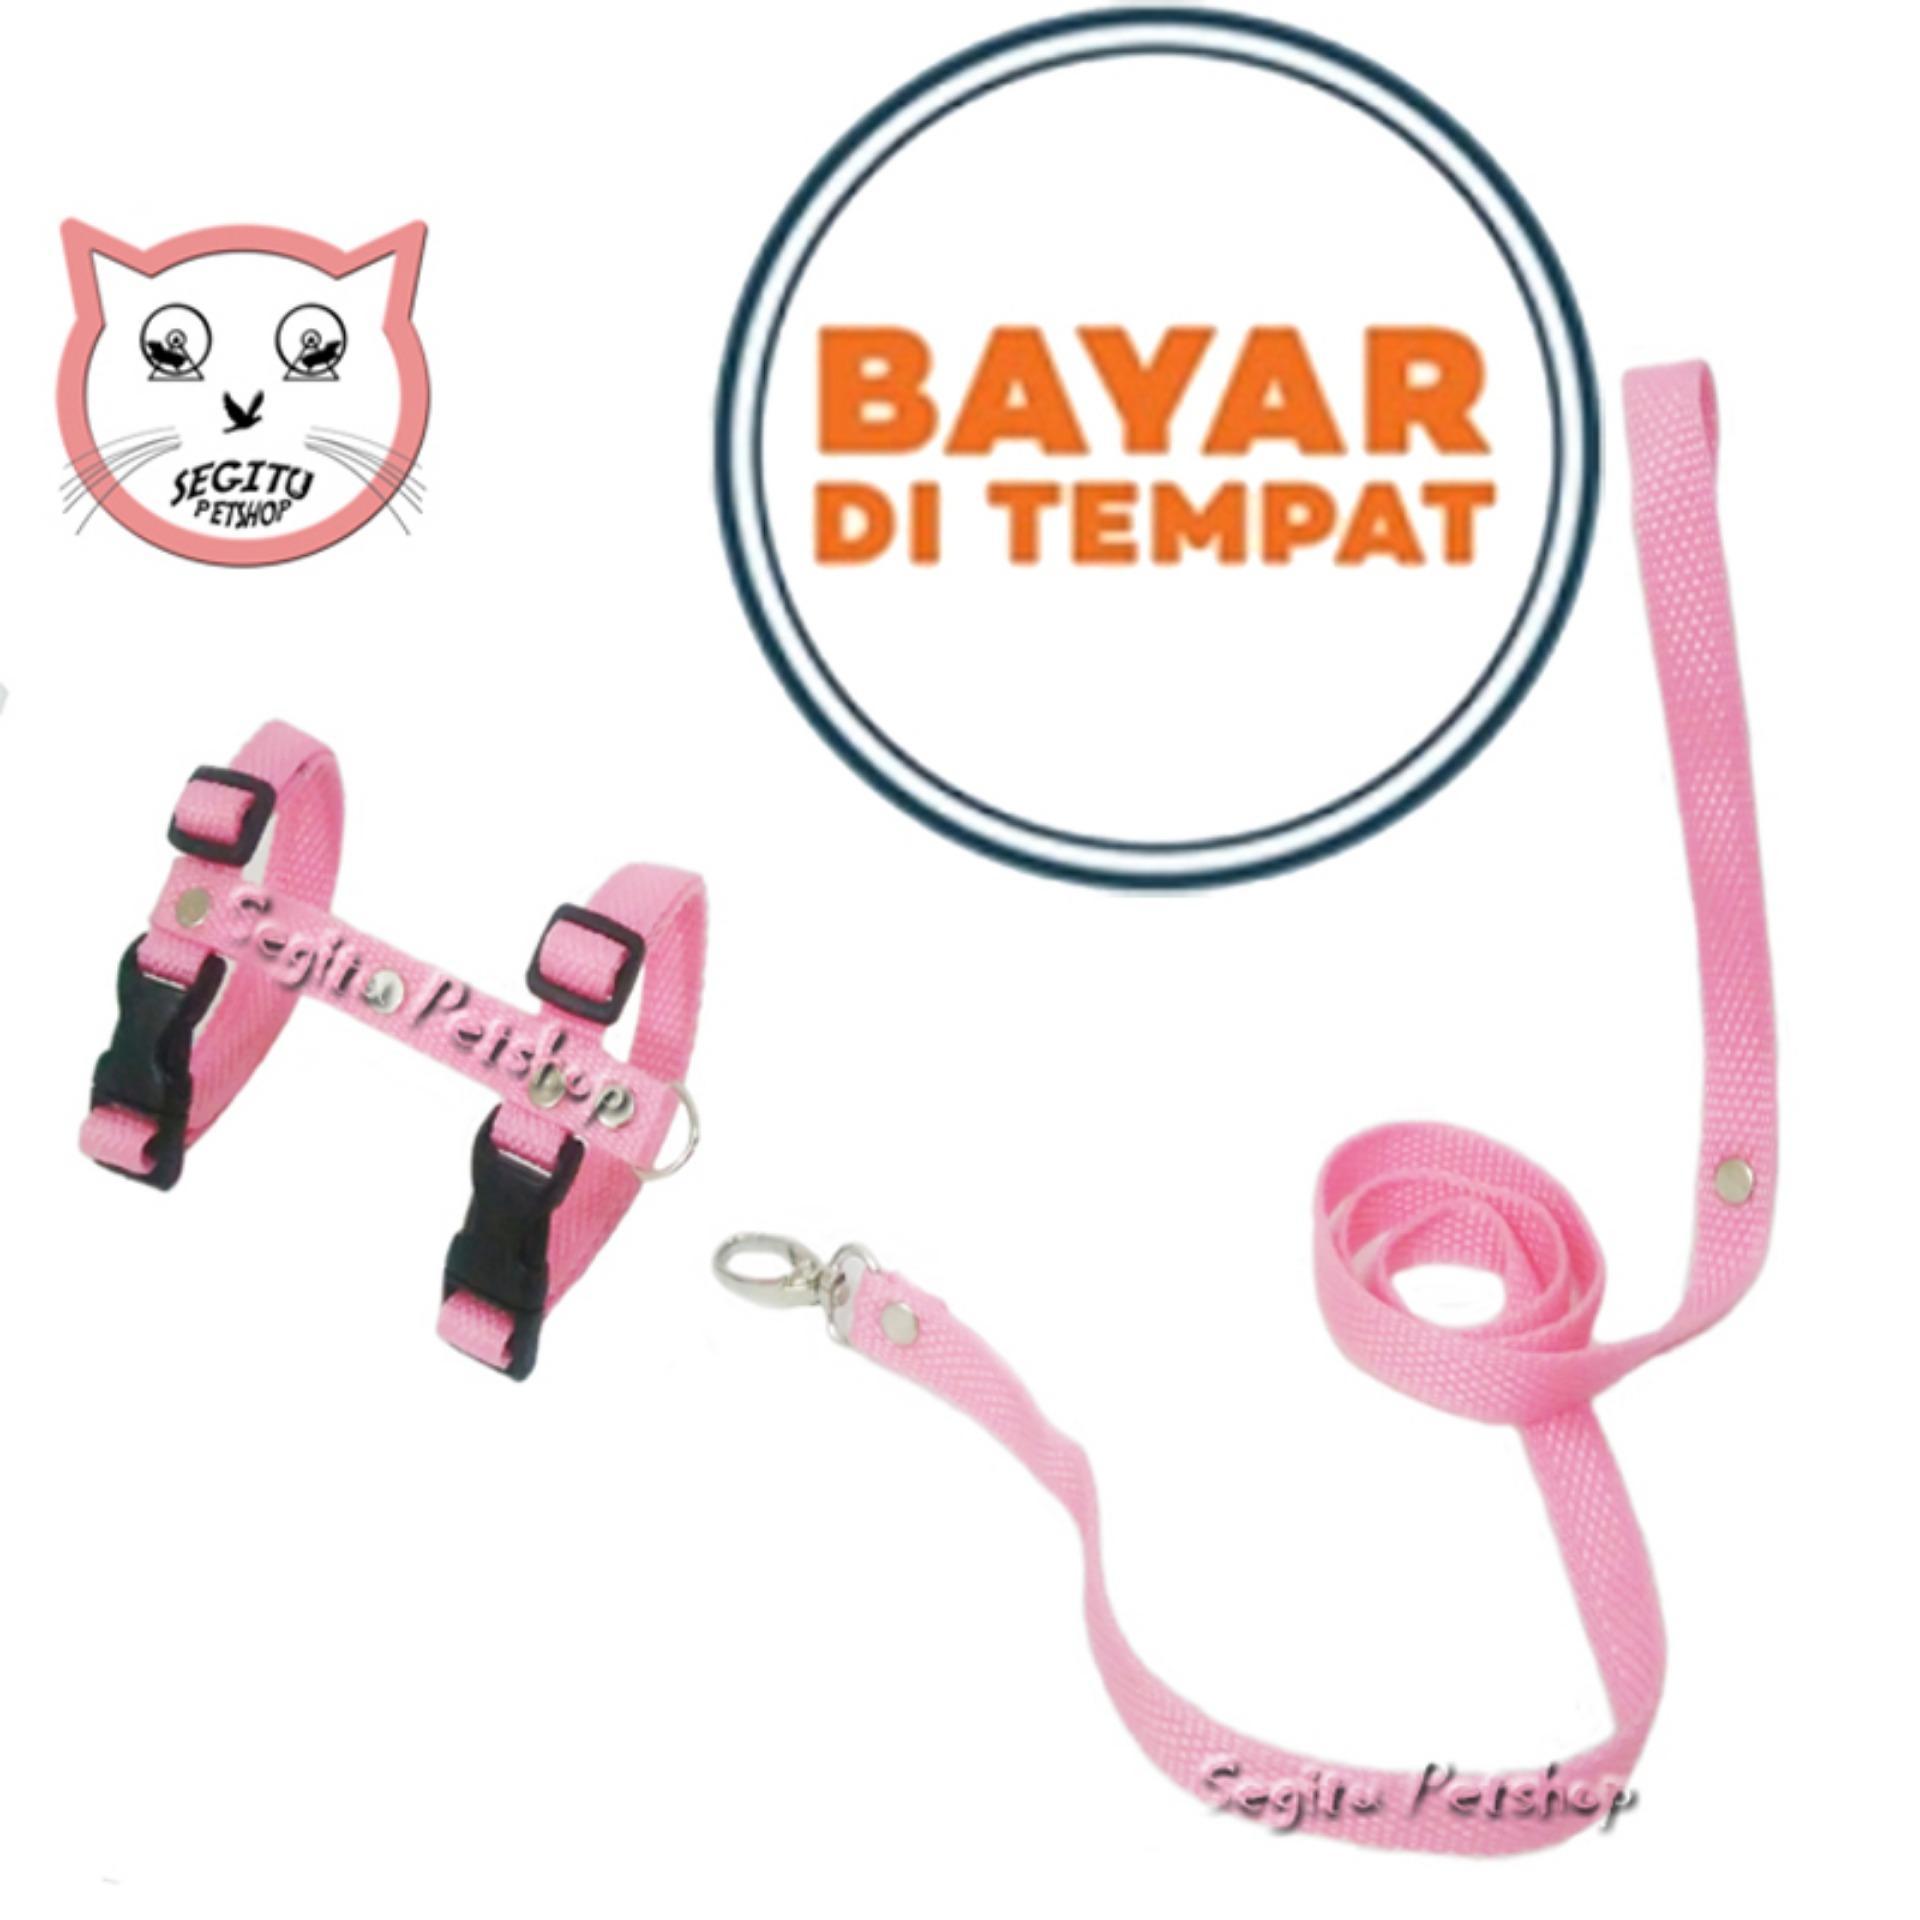 Tali Tuntun Harness H Kucing Musang Kelinci Hewan By Bang Gode-.